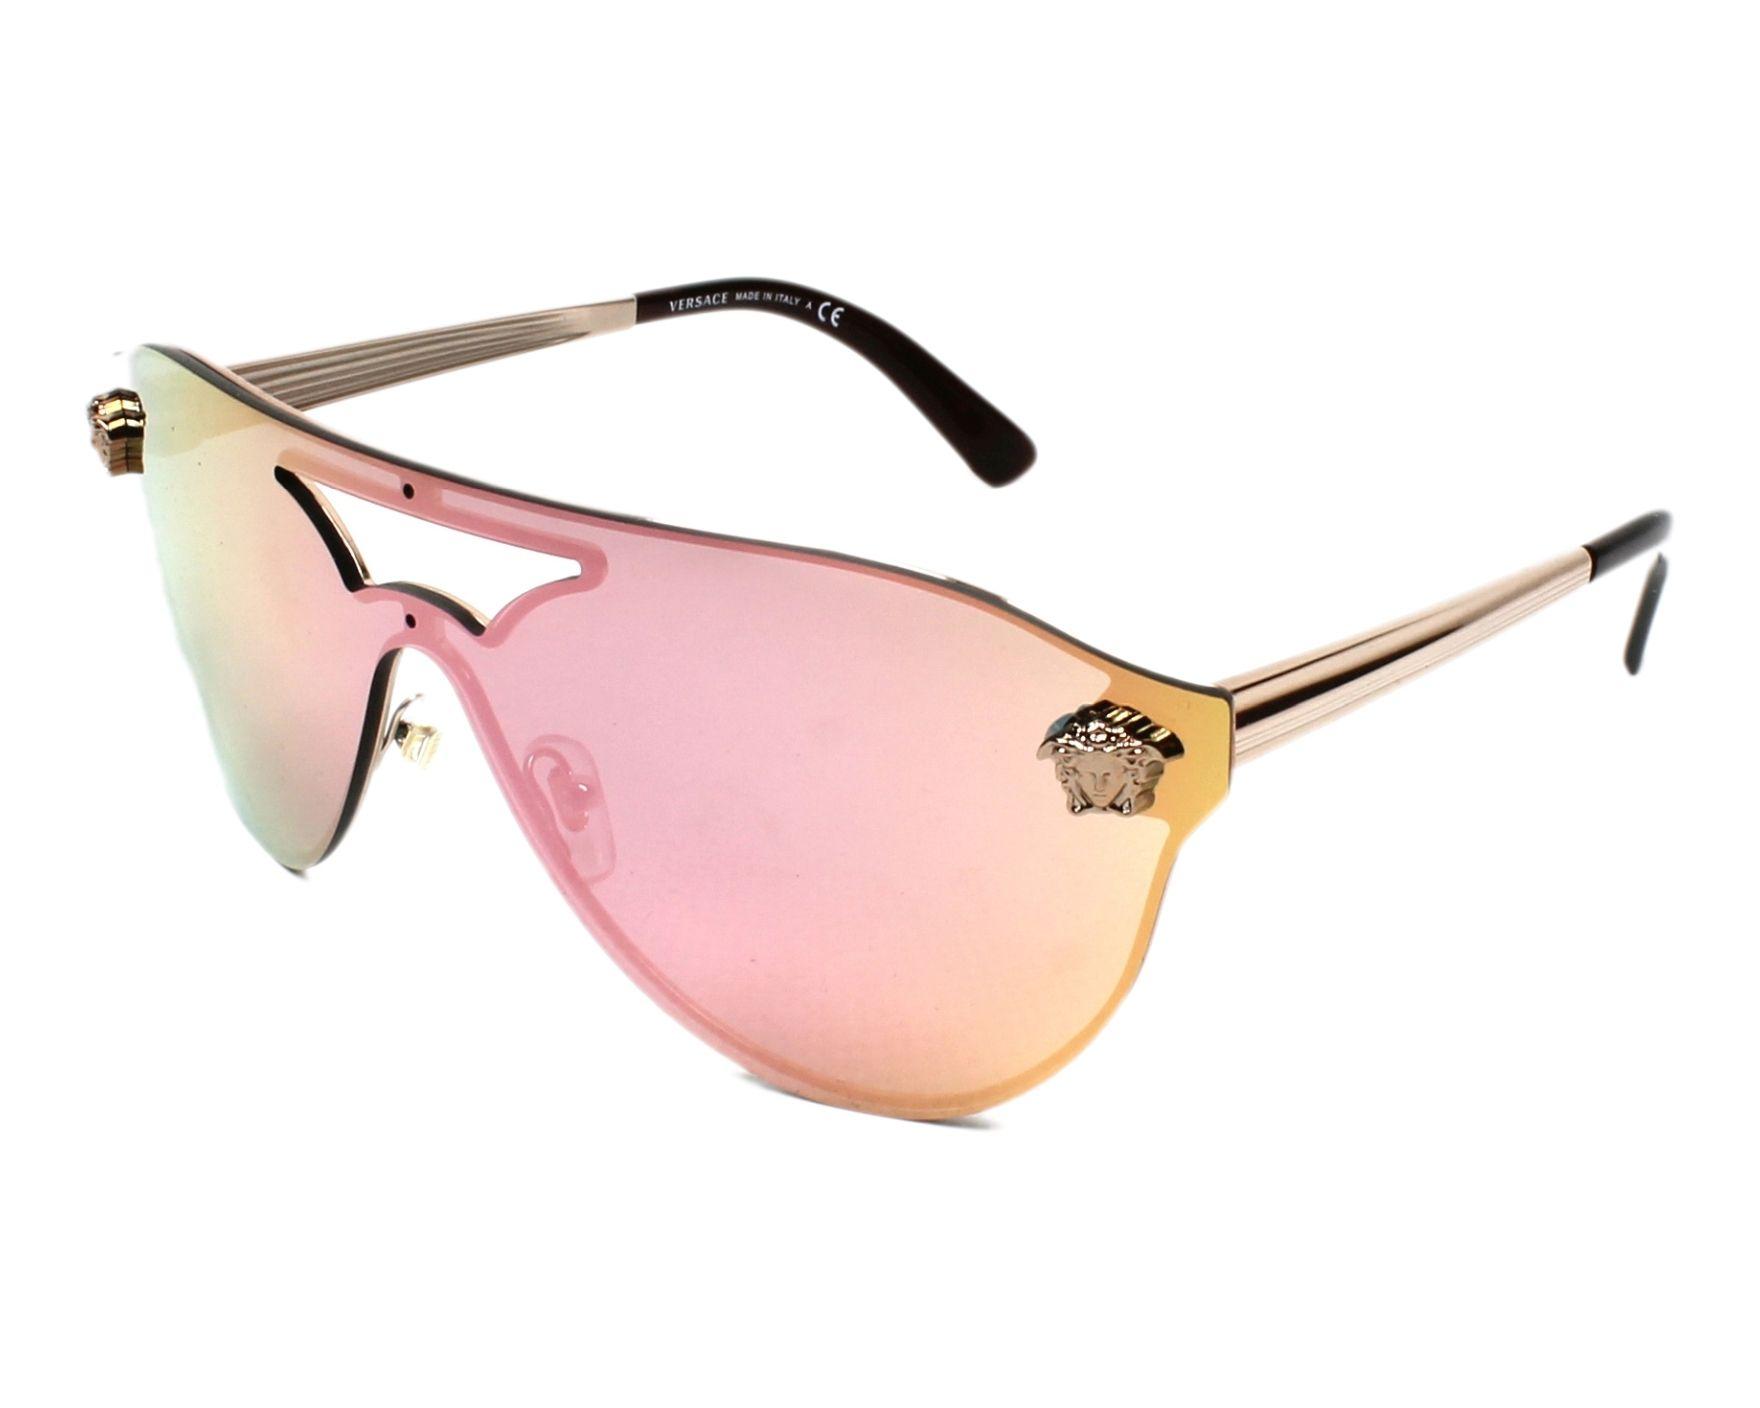 lunettes de soleil versace ve 2161 1052 4z or avec des verres bleu. Black Bedroom Furniture Sets. Home Design Ideas